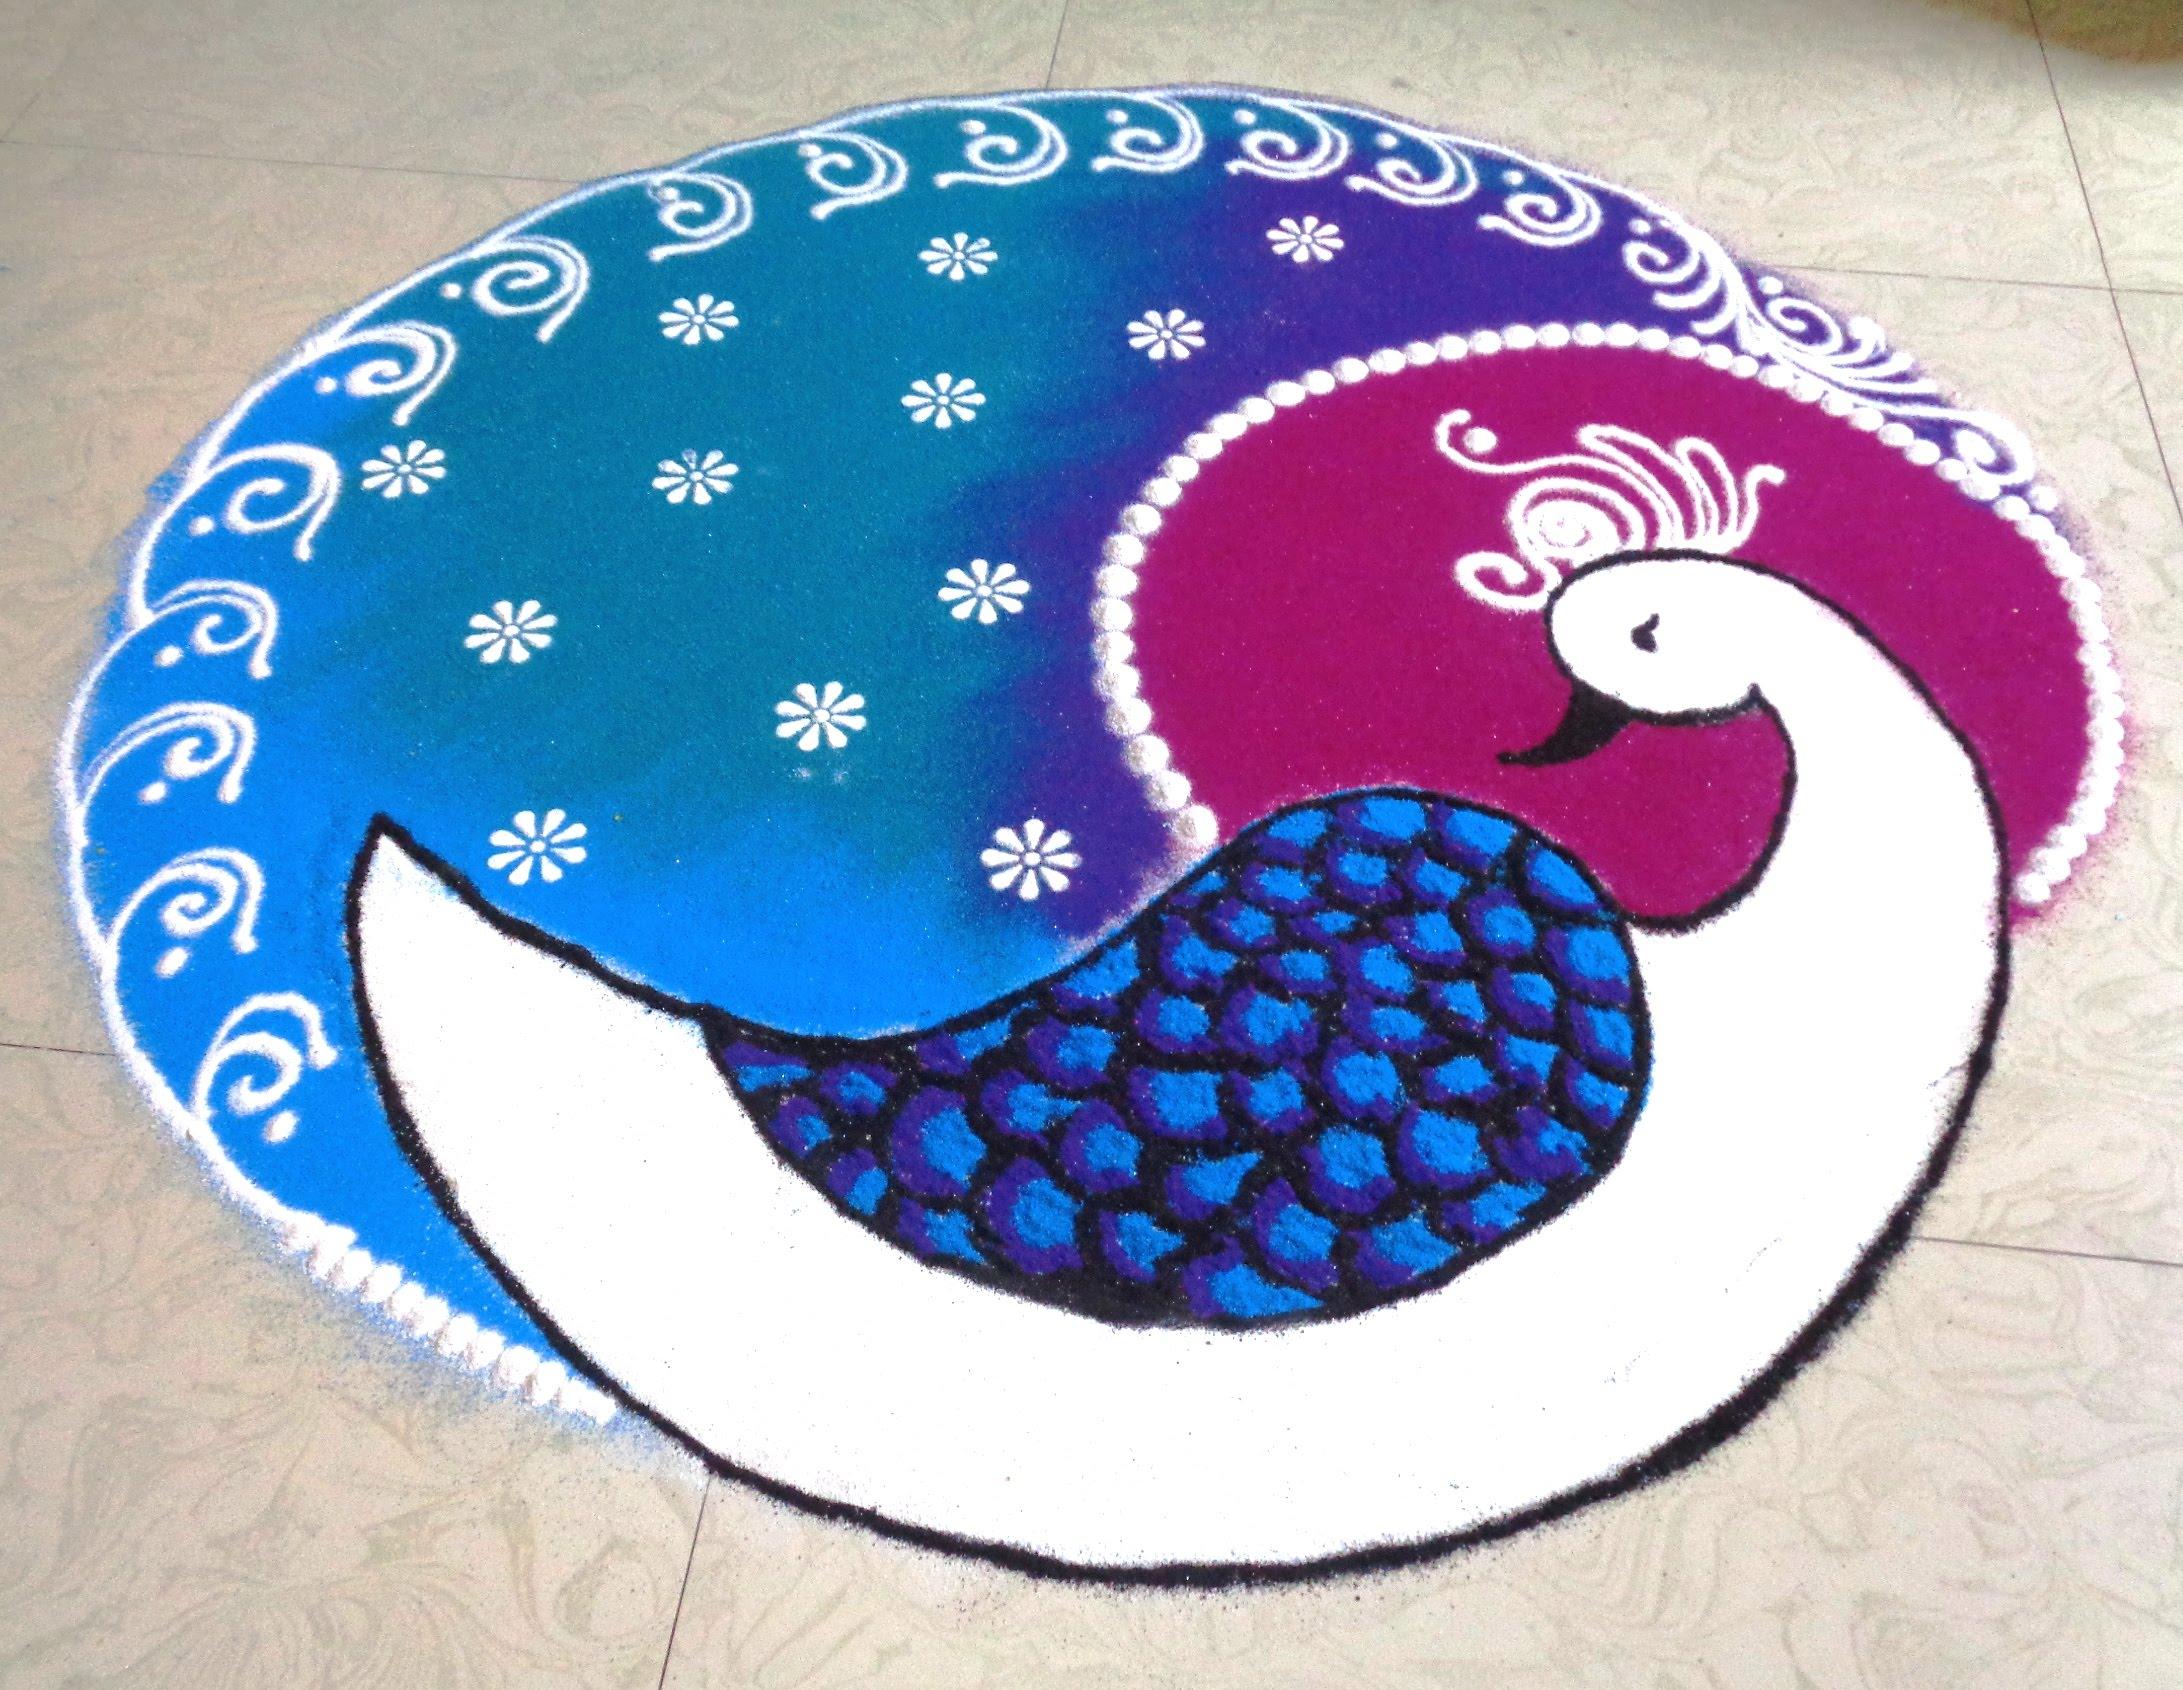 2183x1690 How To Draw Peacock Latest Rangoli